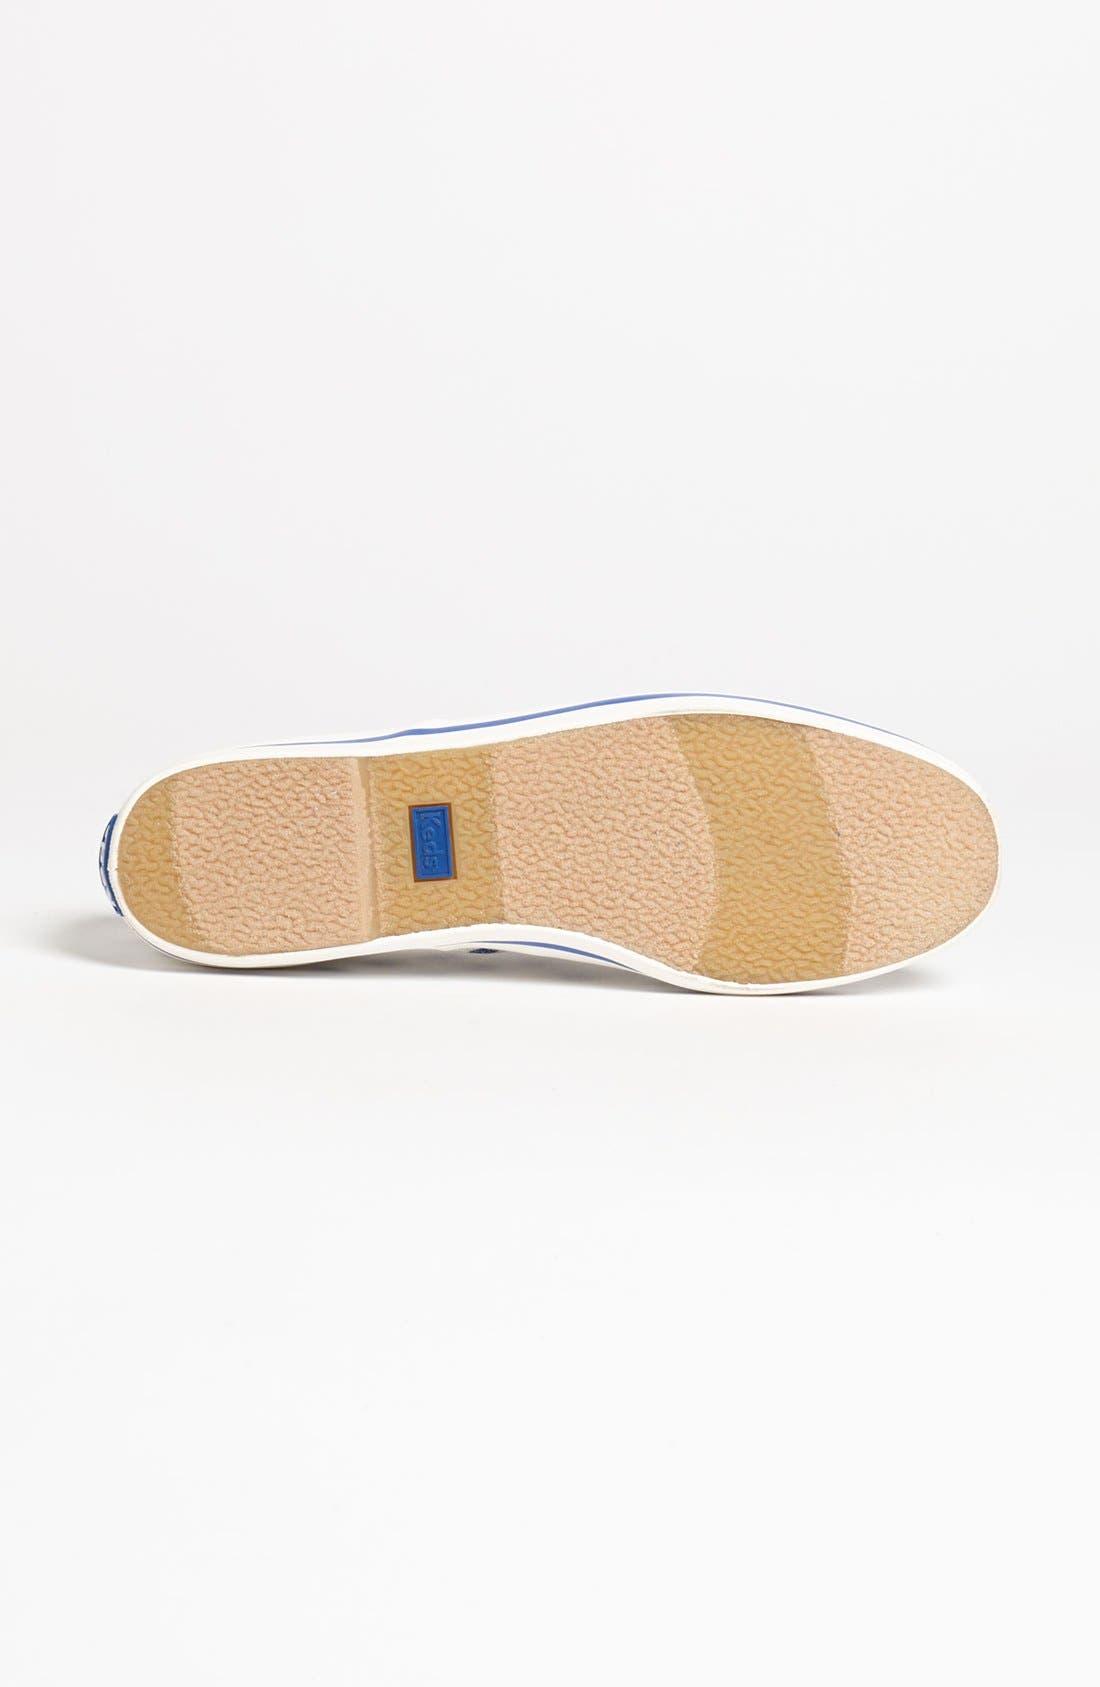 Keds<sup>®</sup> for kate spade new york 'kick' sneaker,                             Alternate thumbnail 9, color,